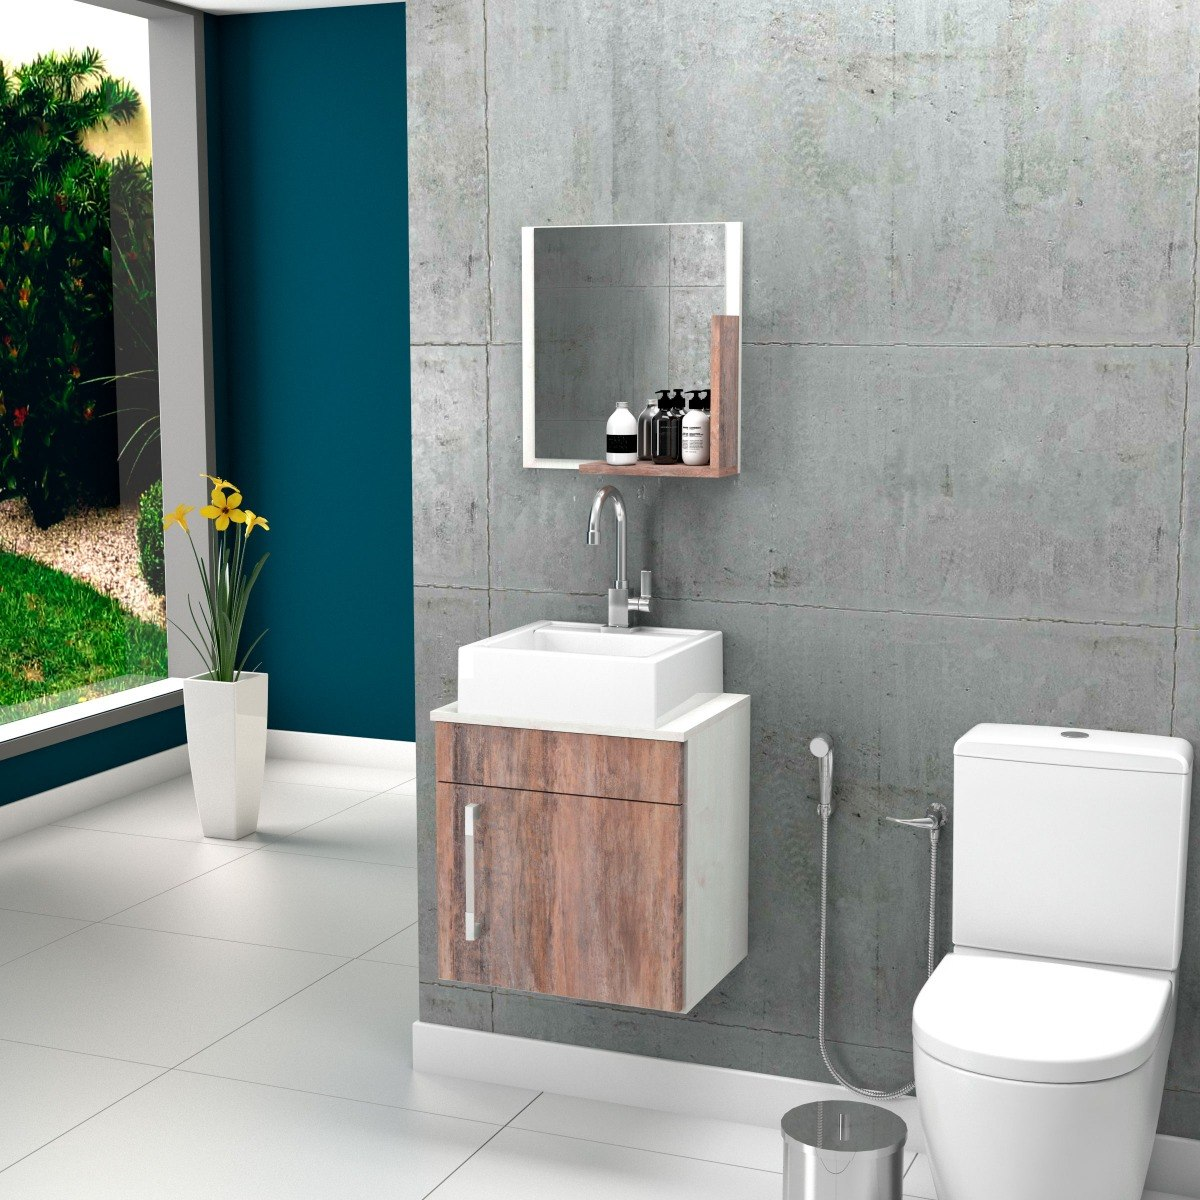 Armario De Banheiro Pequeno Simples De Moveis Para